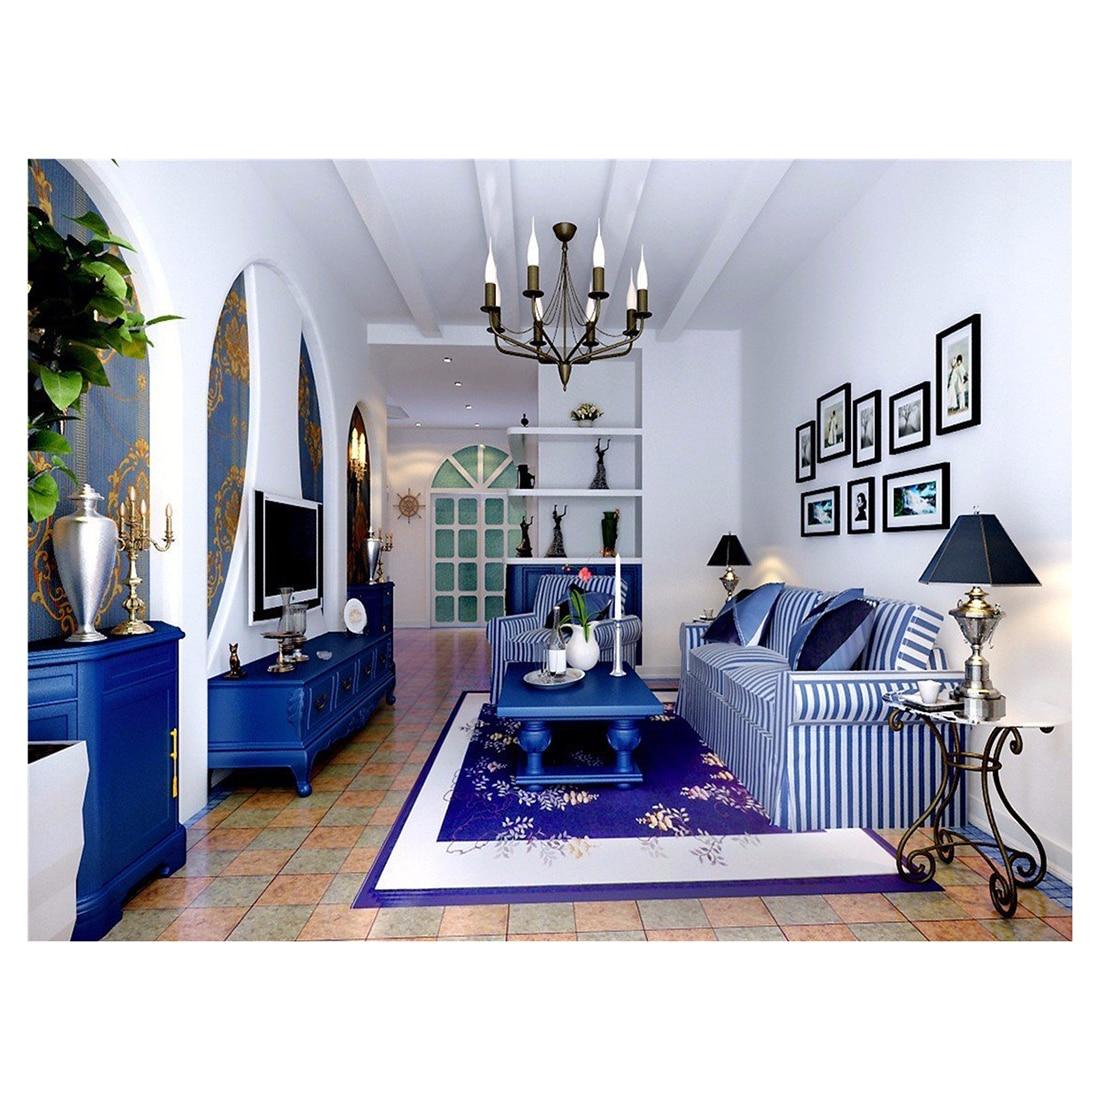 living scene sofa studio backdrops props backgrounds printed vinyl lights